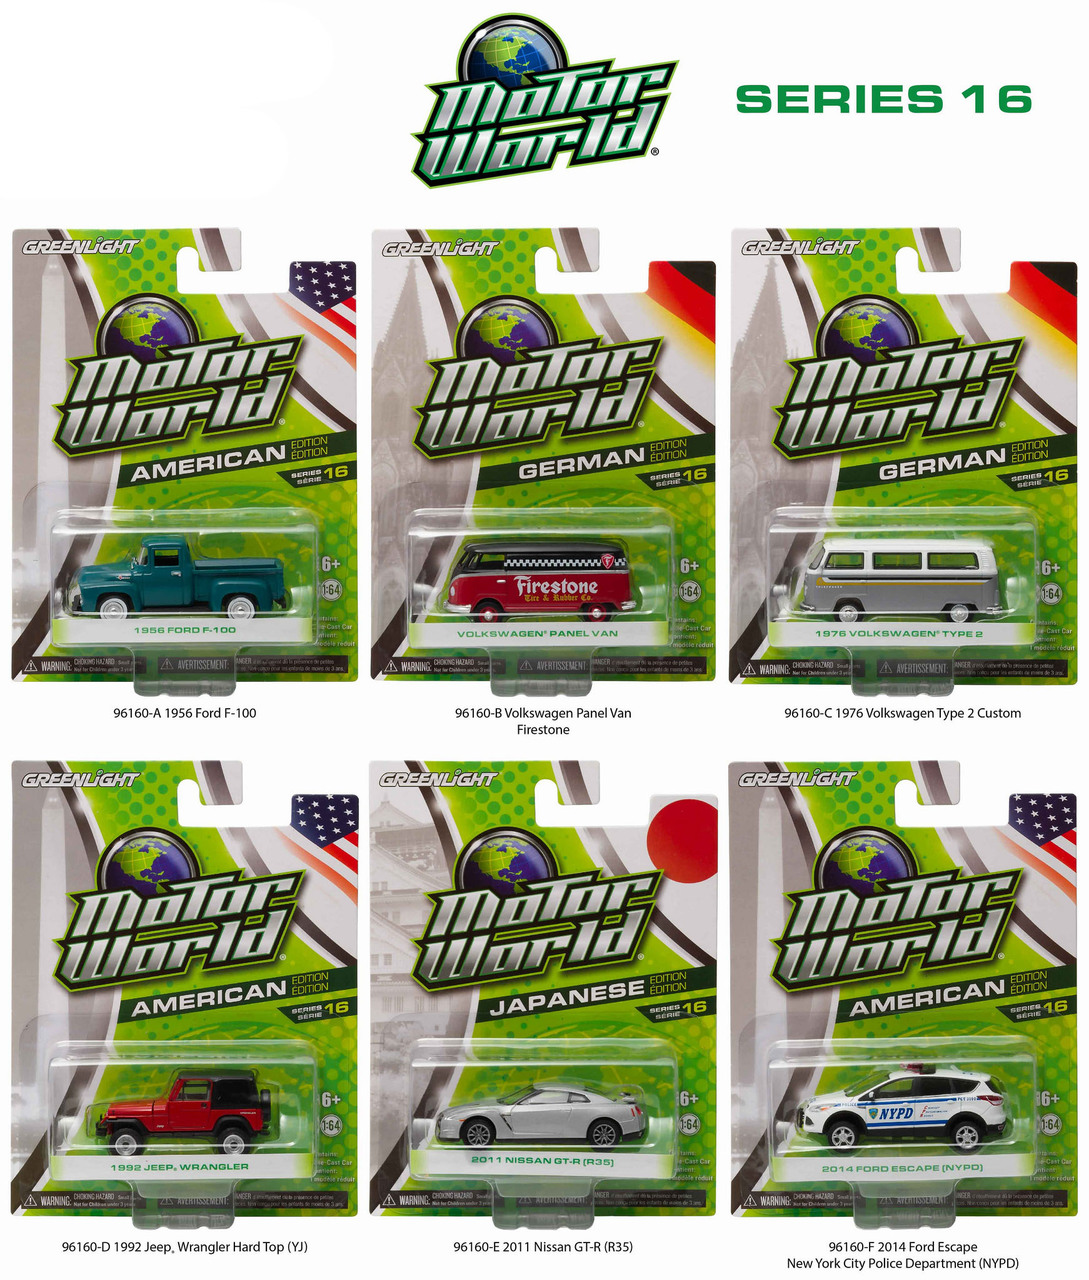 Motor World Series 16 6pc Diecast Car Set 1/64 Diecast Model Cars by Greenlight